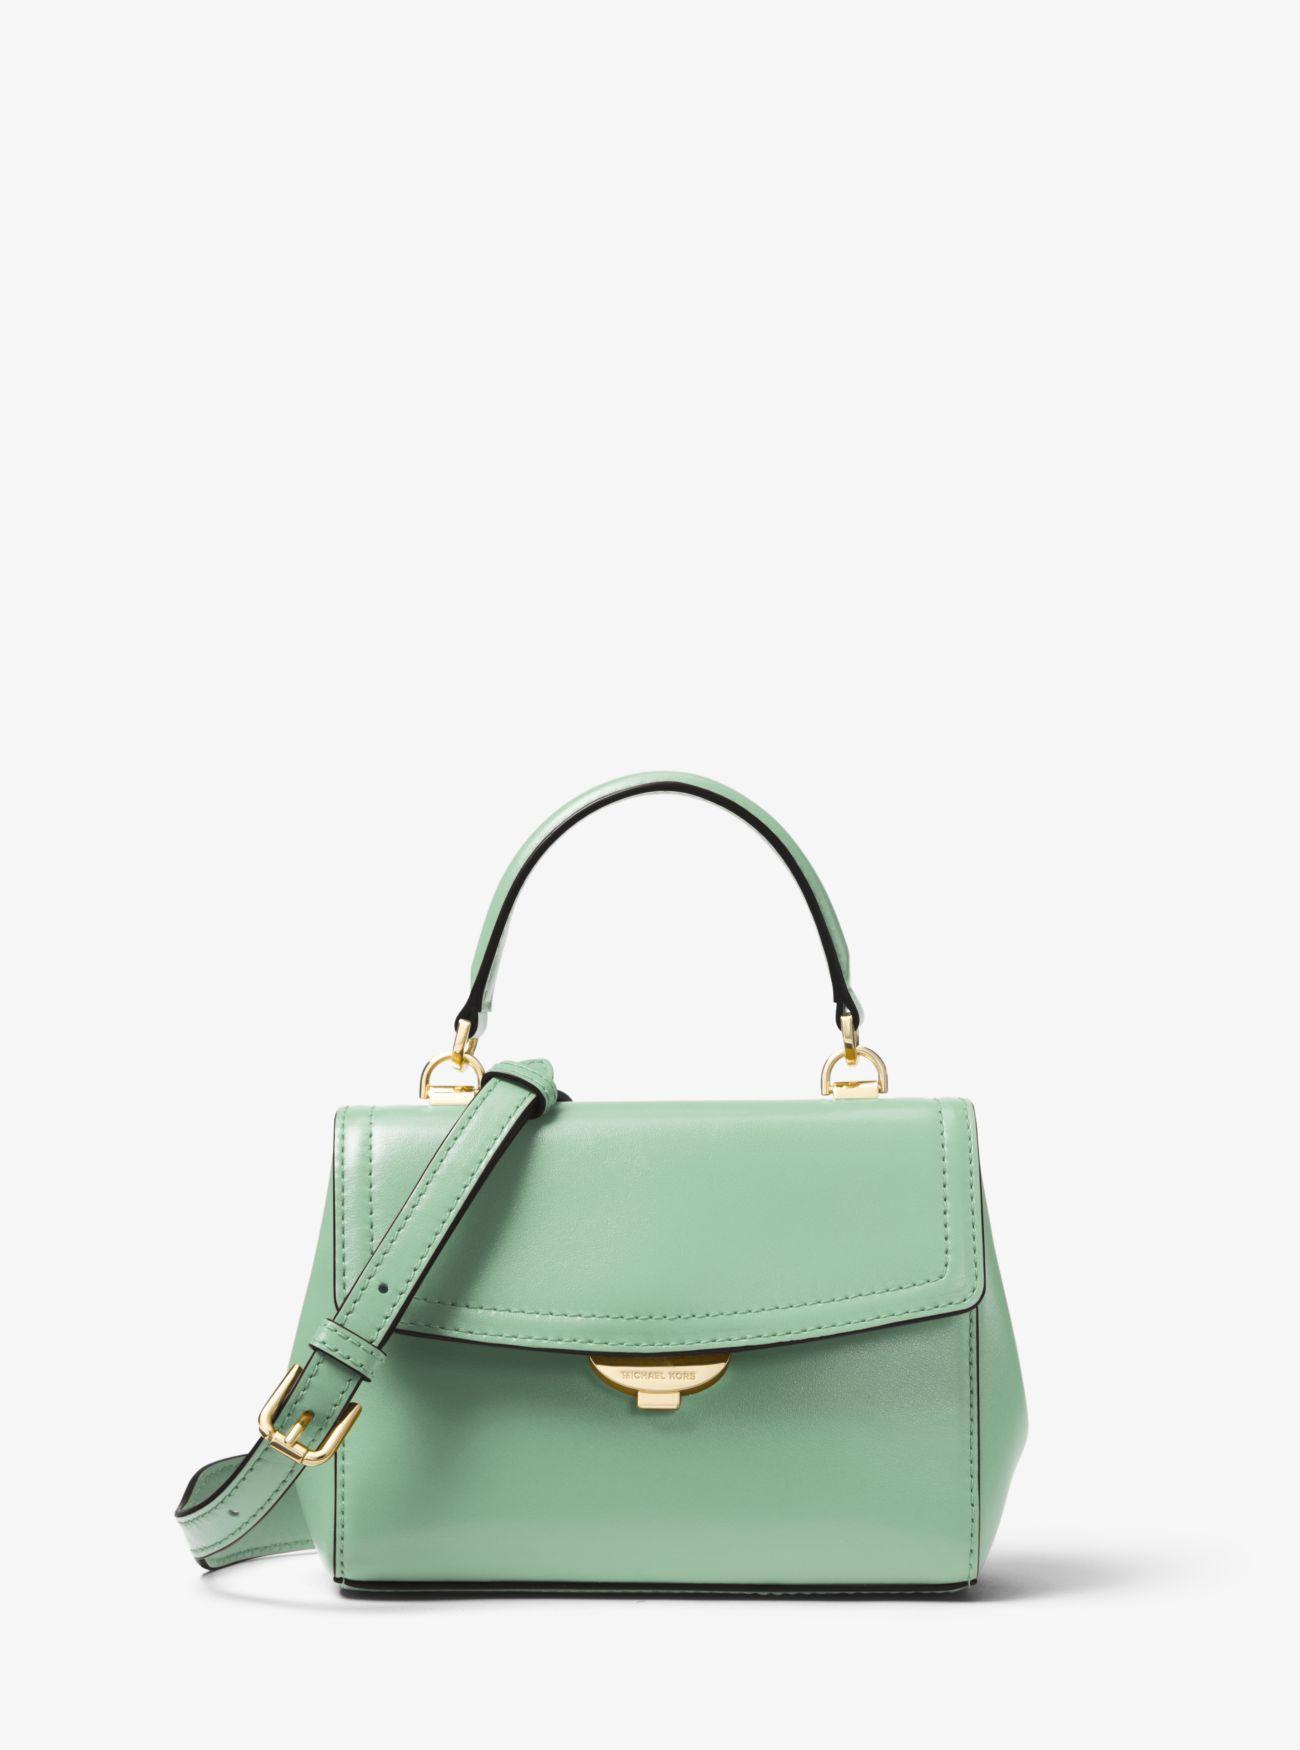 00fc004141f2 MICHAEL Michael Kors. Women's Green Ava Extra-small Leather Crossbody Bag